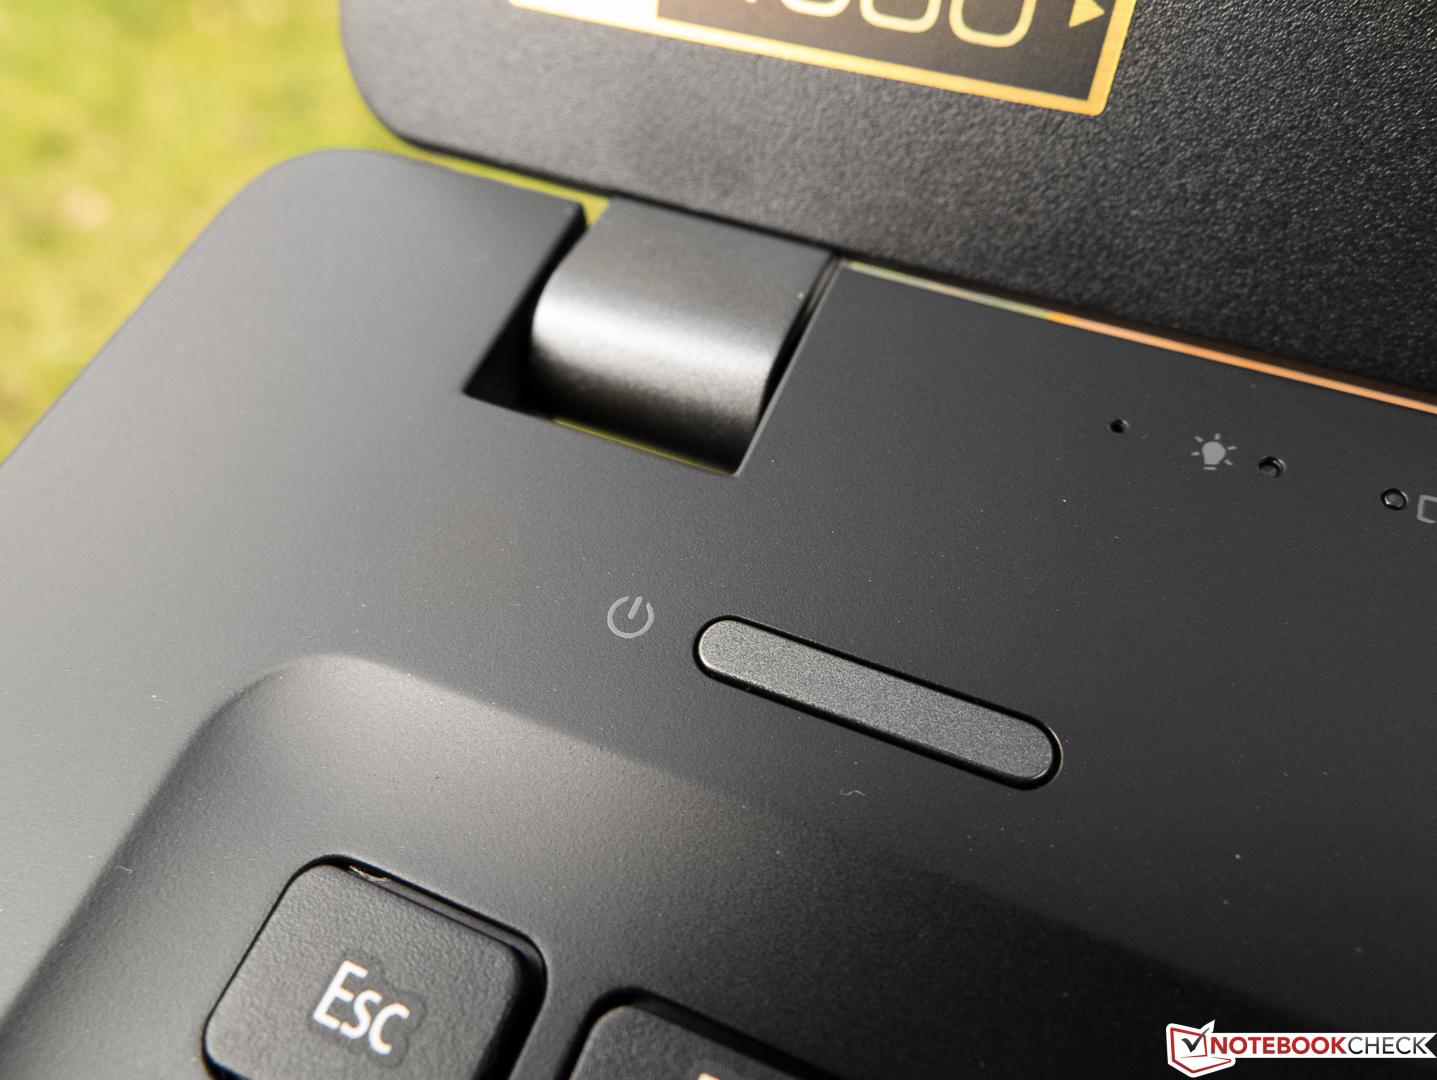 Acer Aspire V3-372